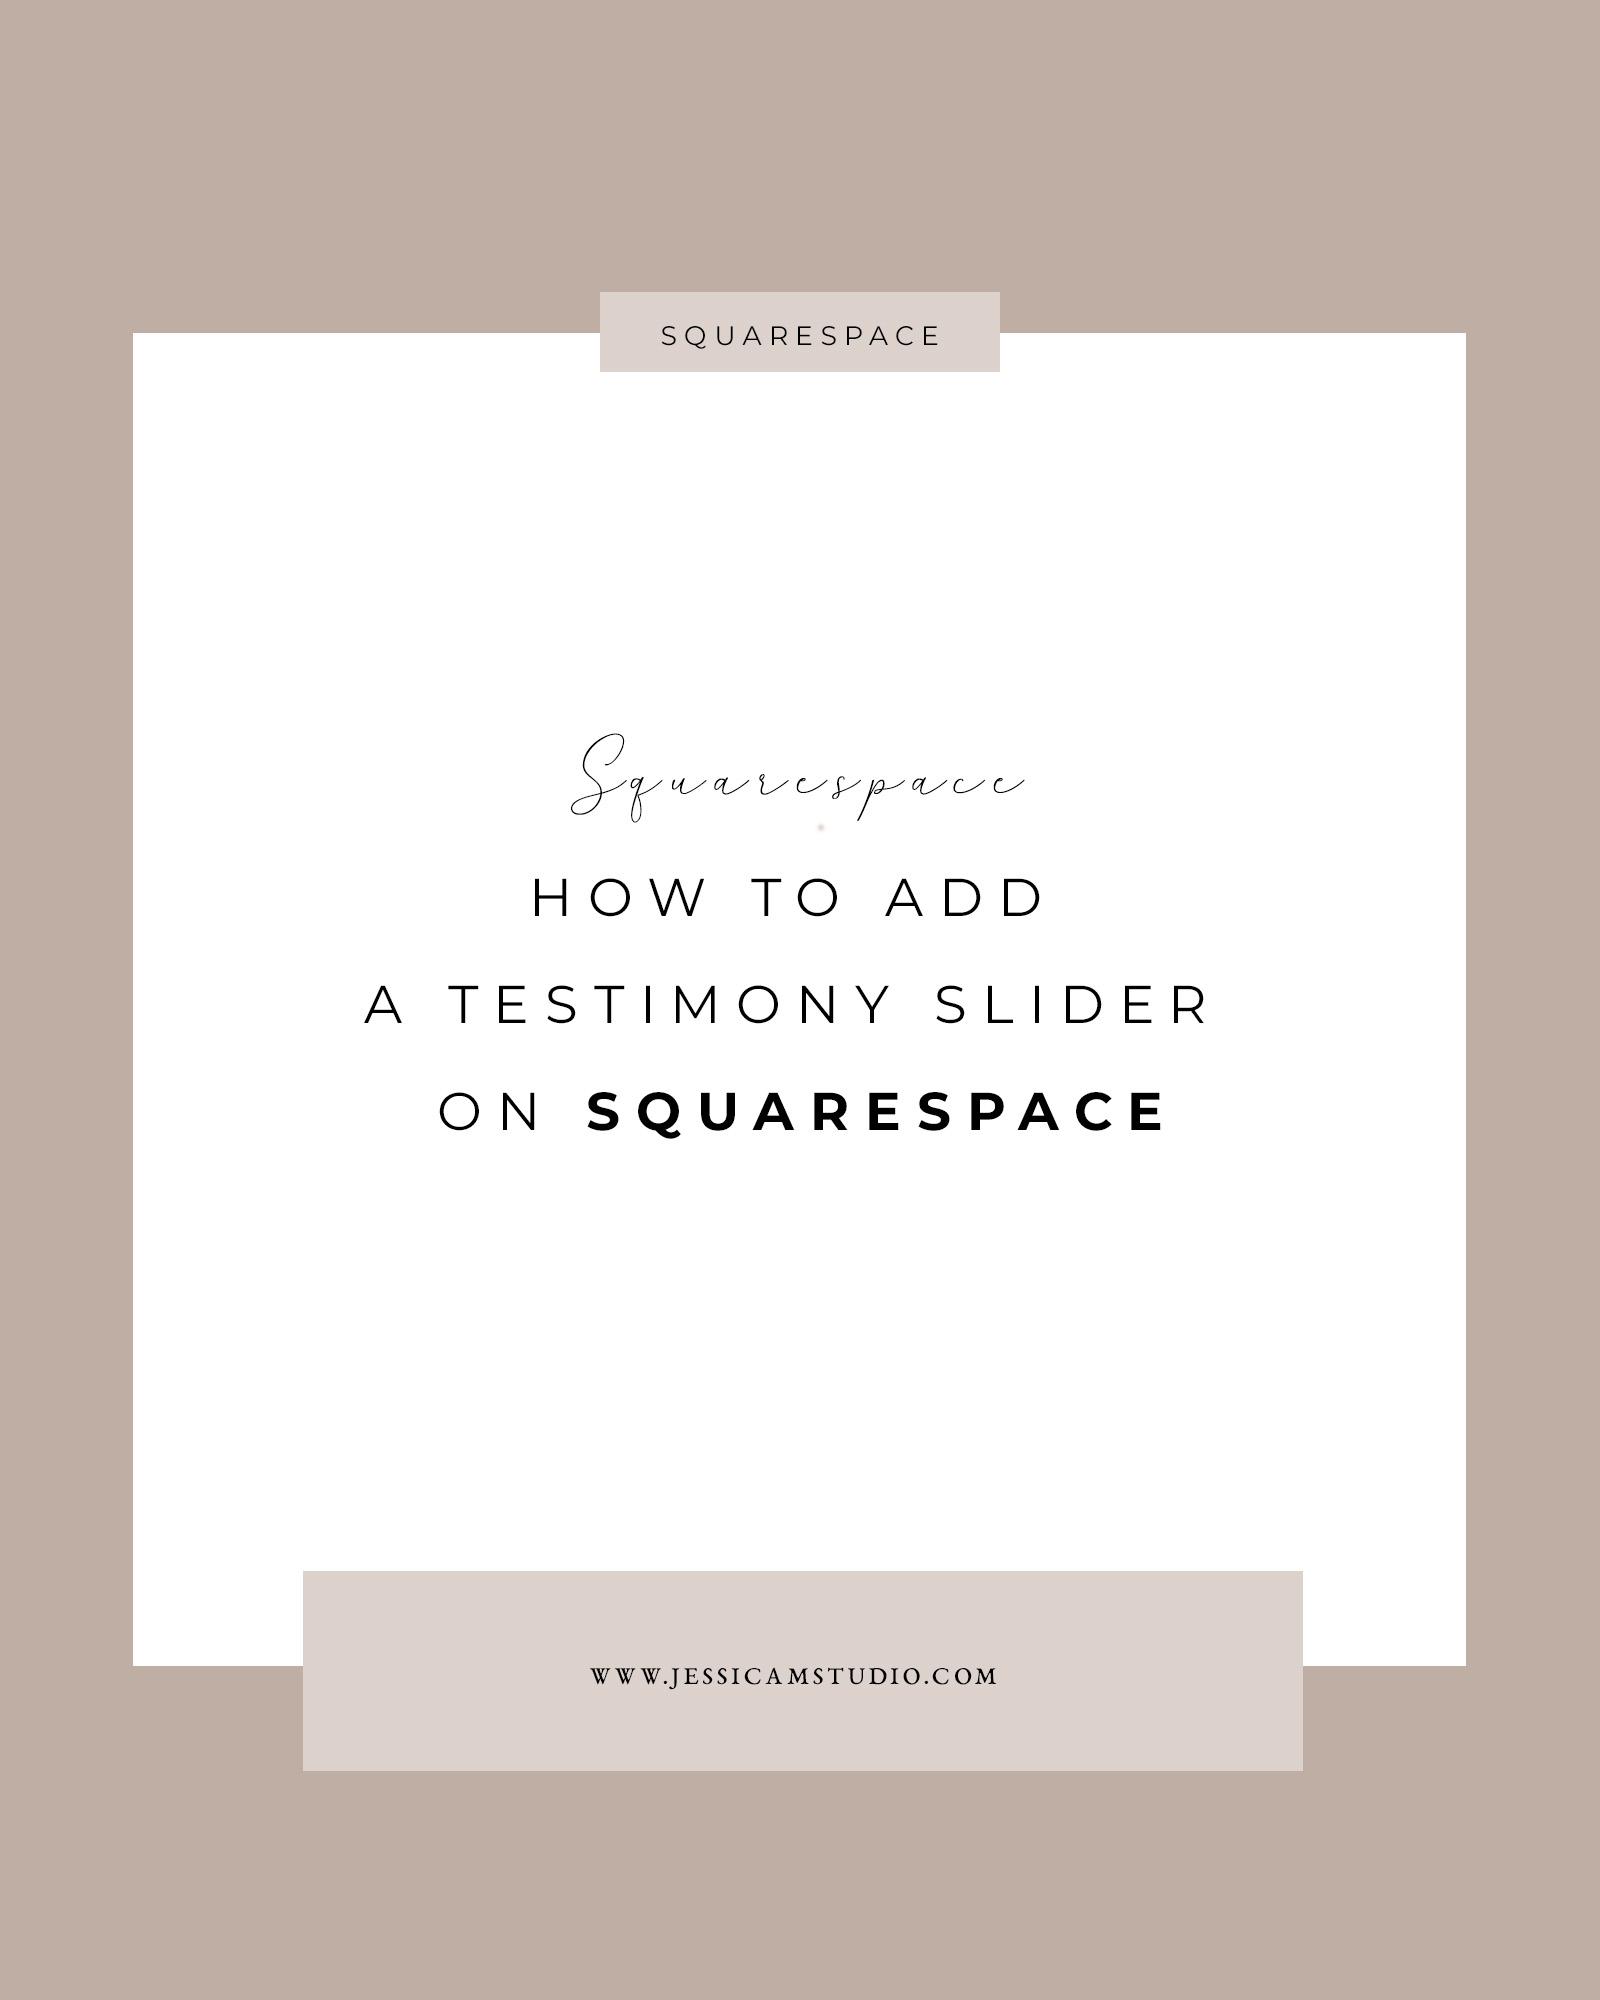 squarespace-testimonial-slider